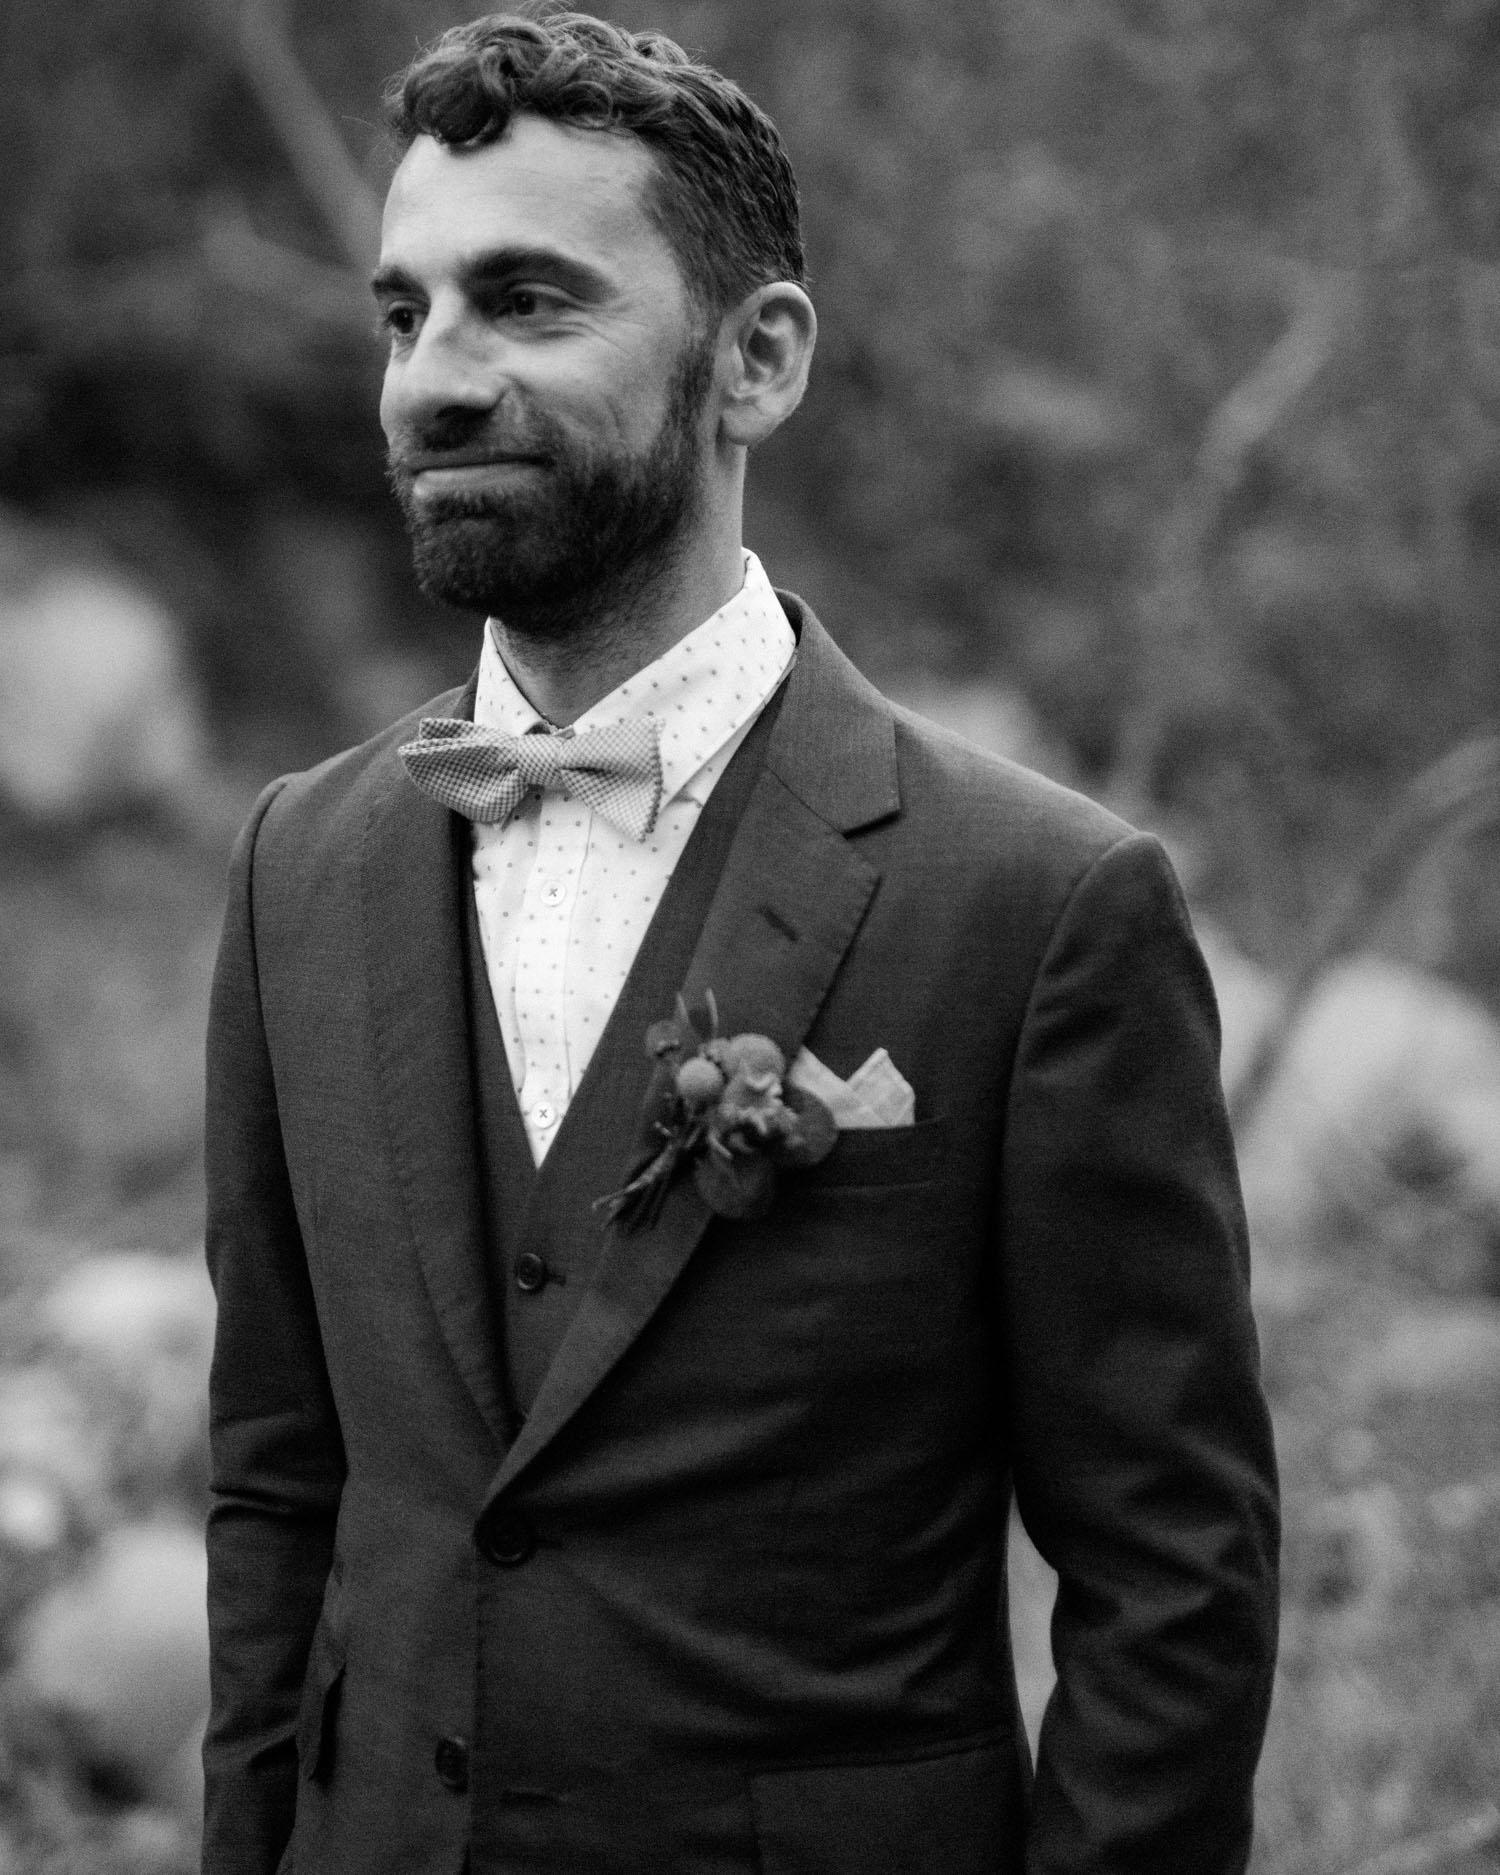 Ojai Wedding Photographer, Calliote Canyon Wedding - The Gathering Season x weareleoandkat 069.JPG